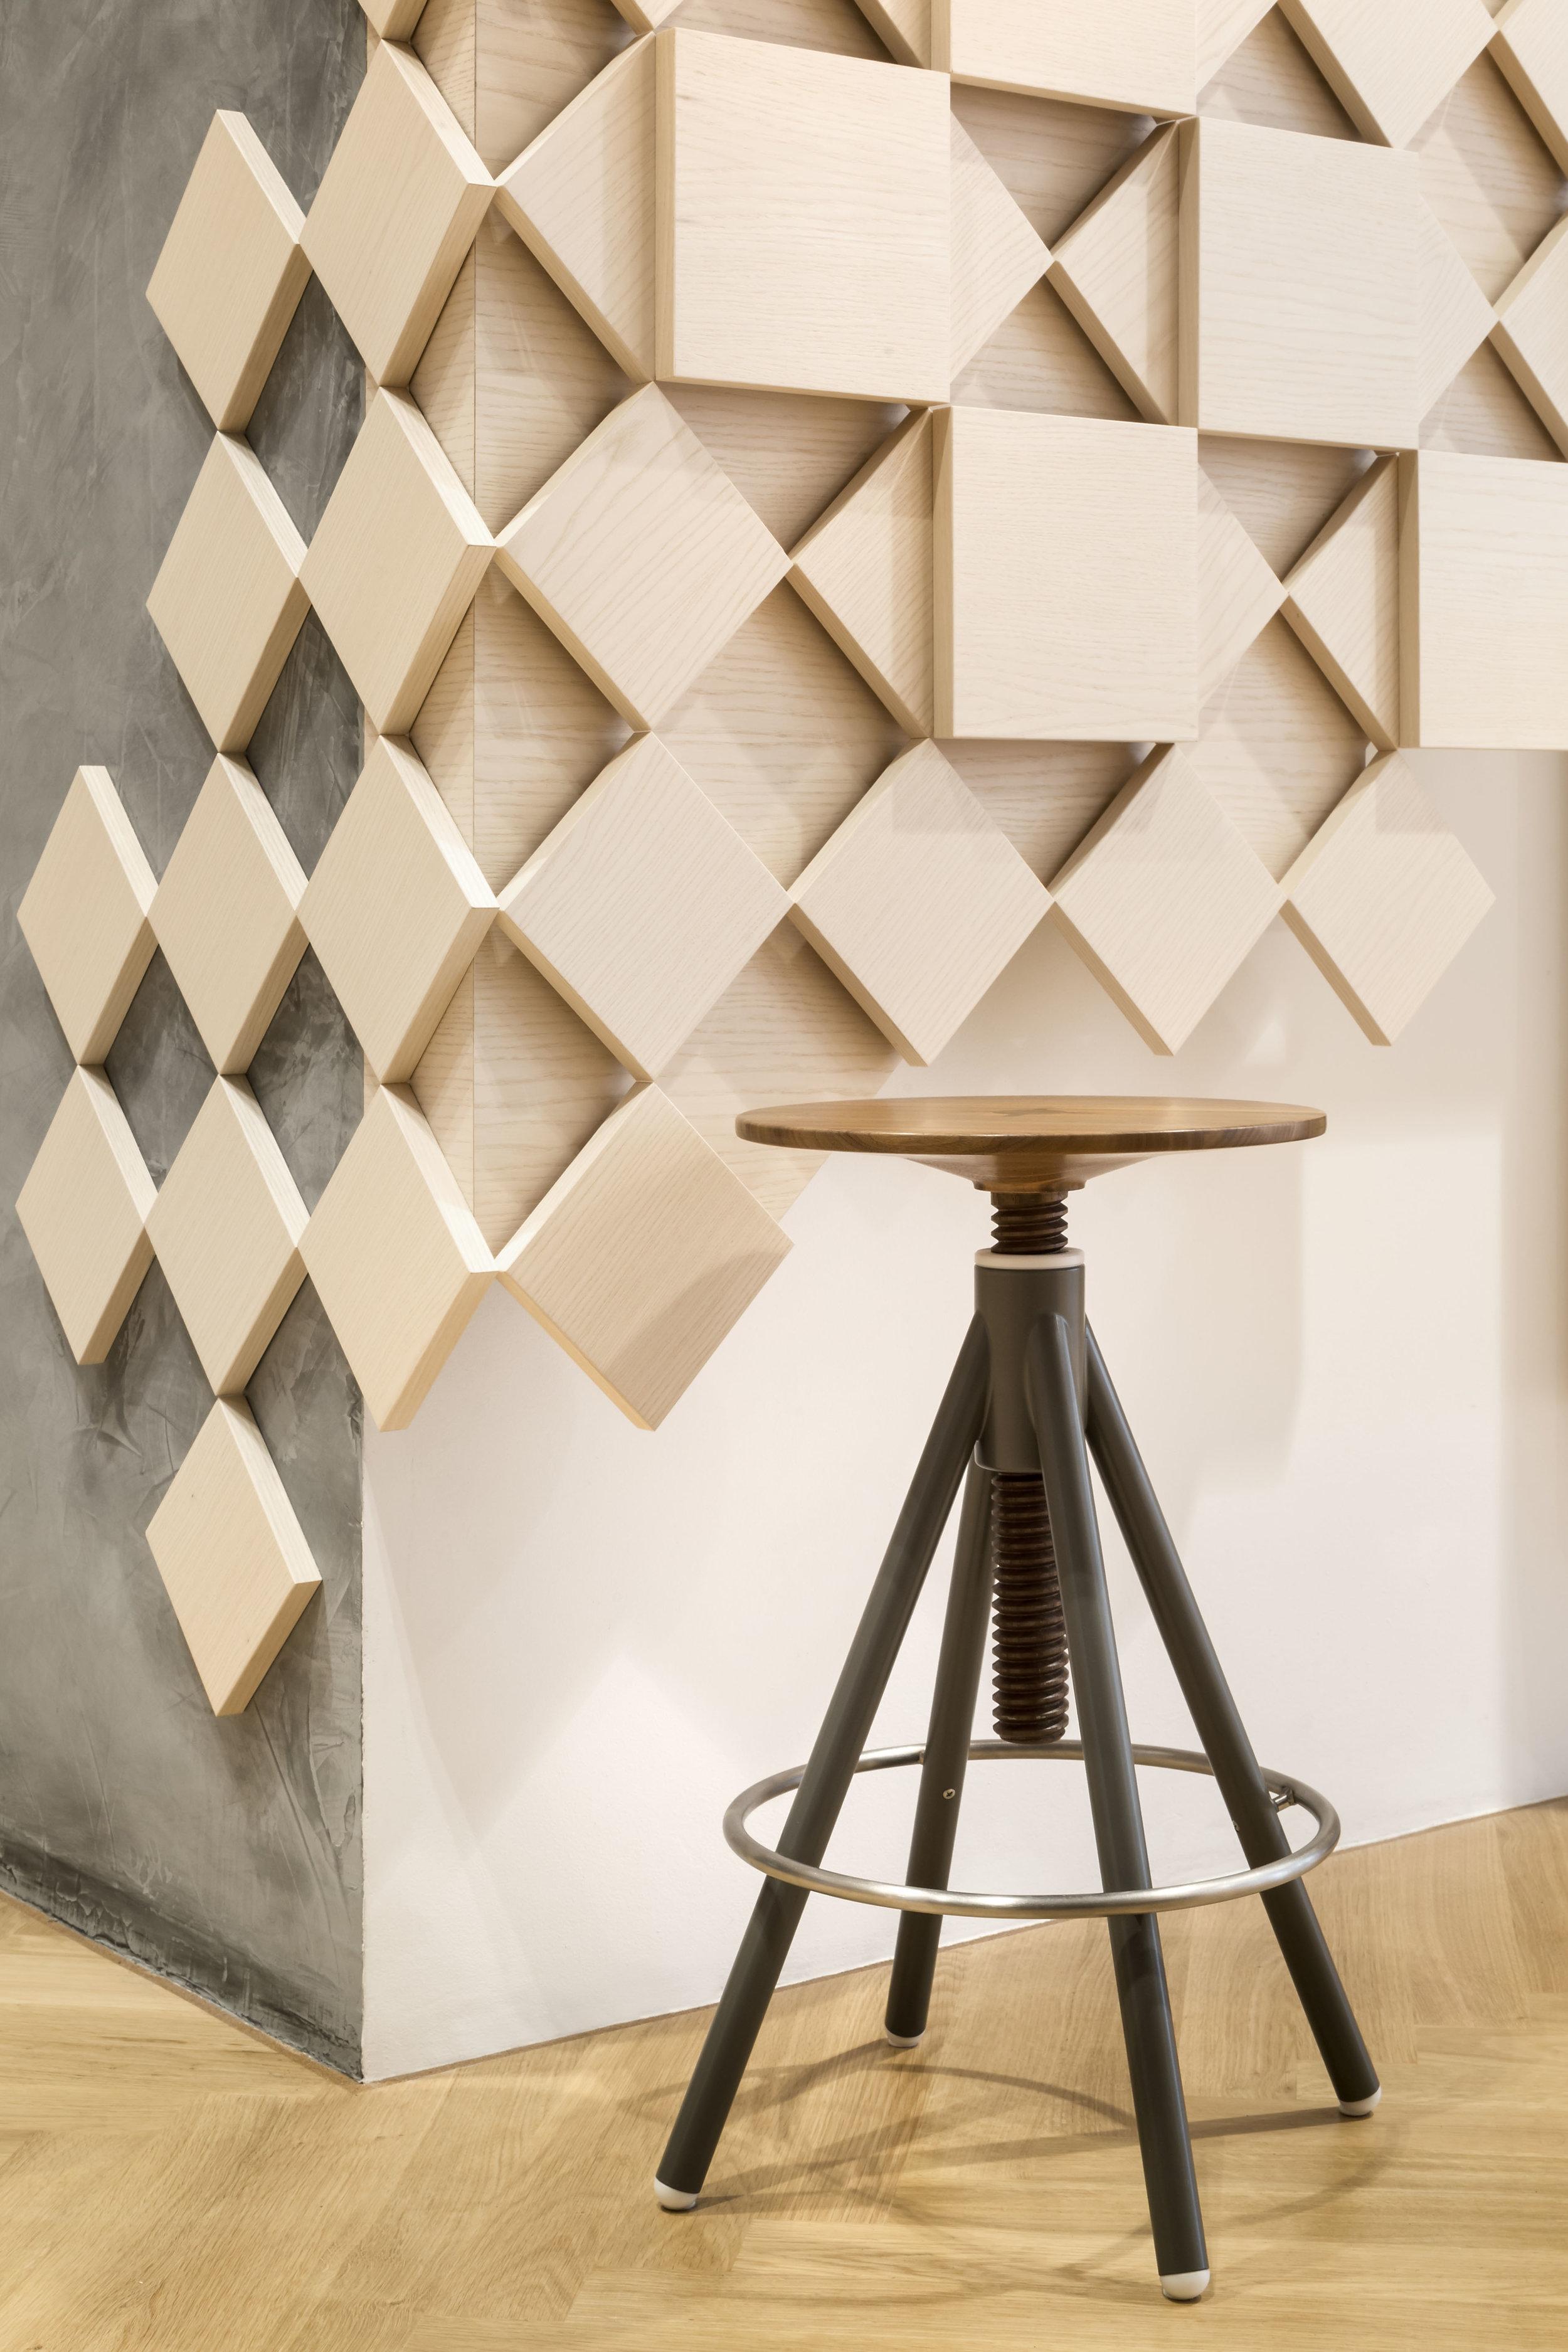 technogel-experience-center_retail-interior-design_coordination-berlin_10.jpg